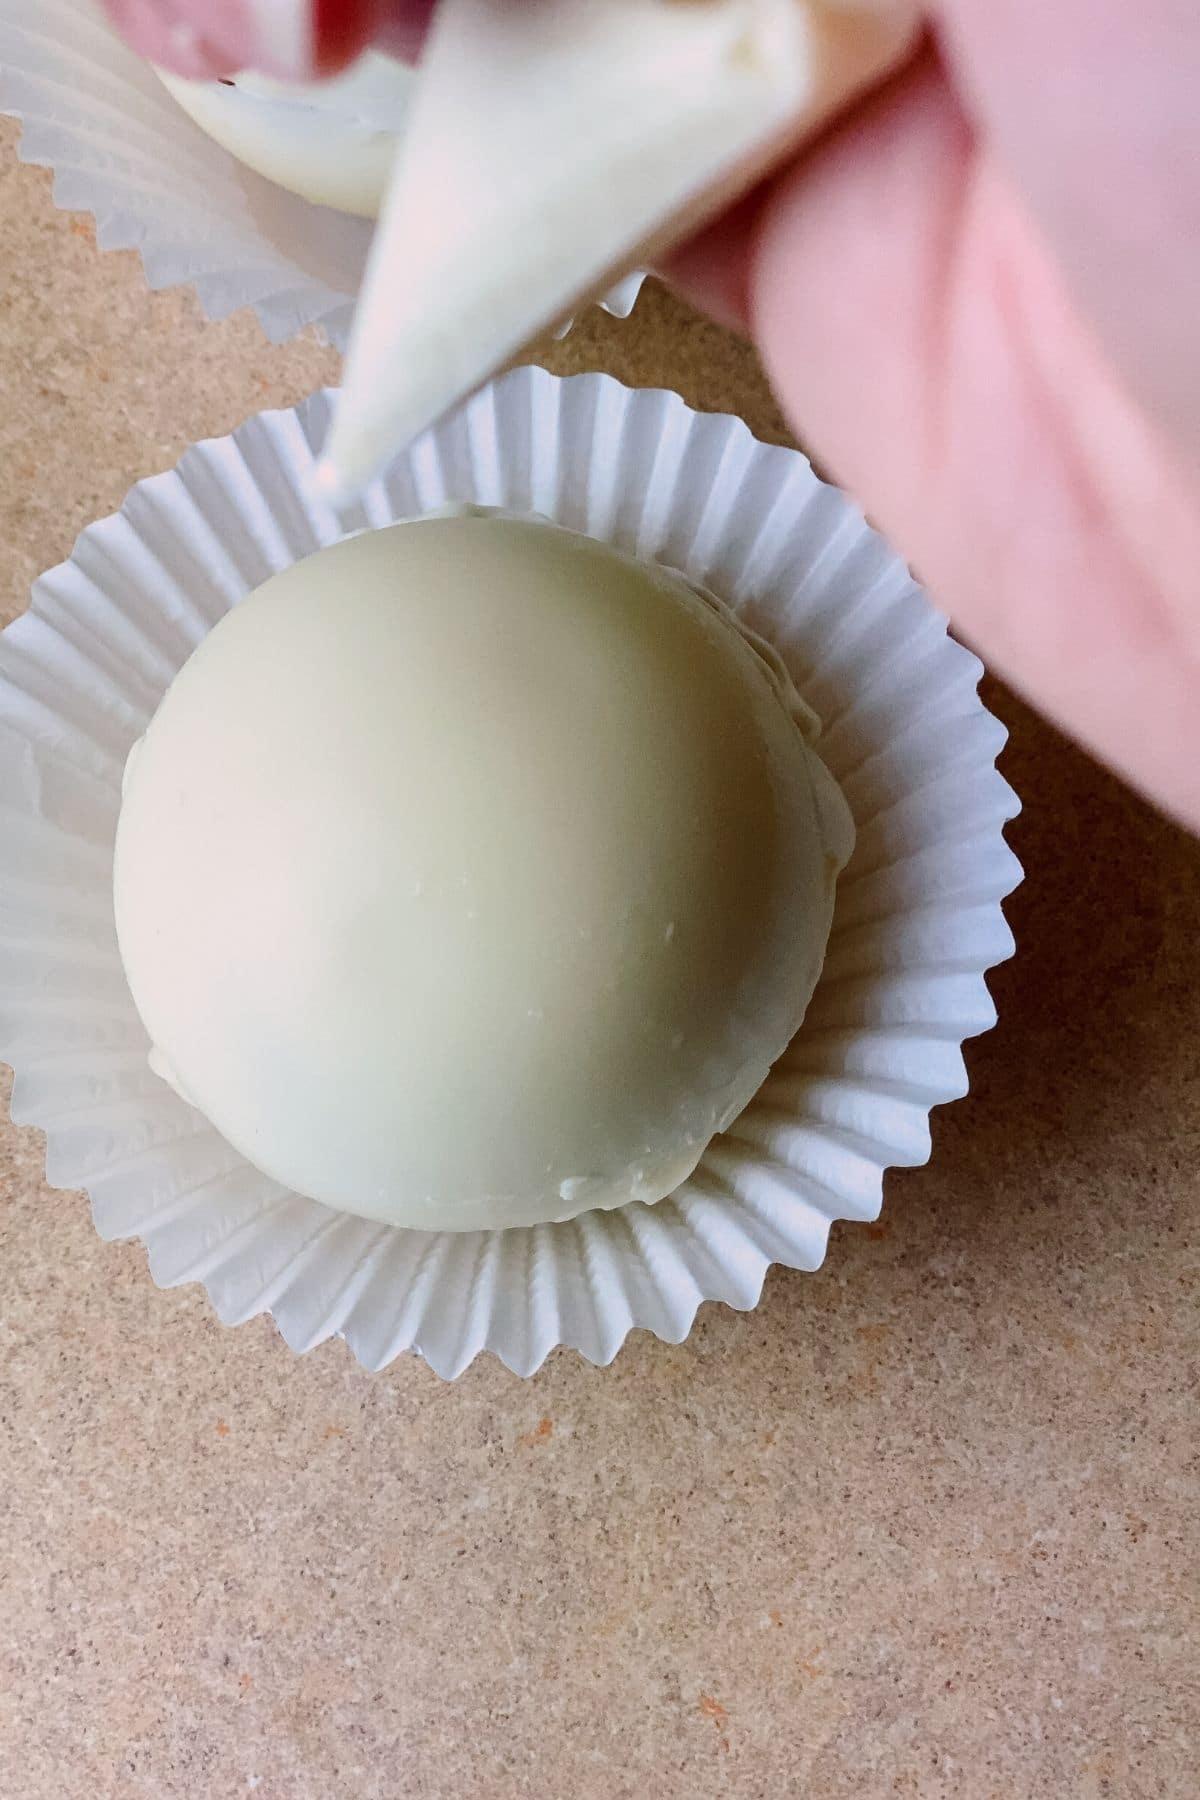 Piping onto white chocolate ball